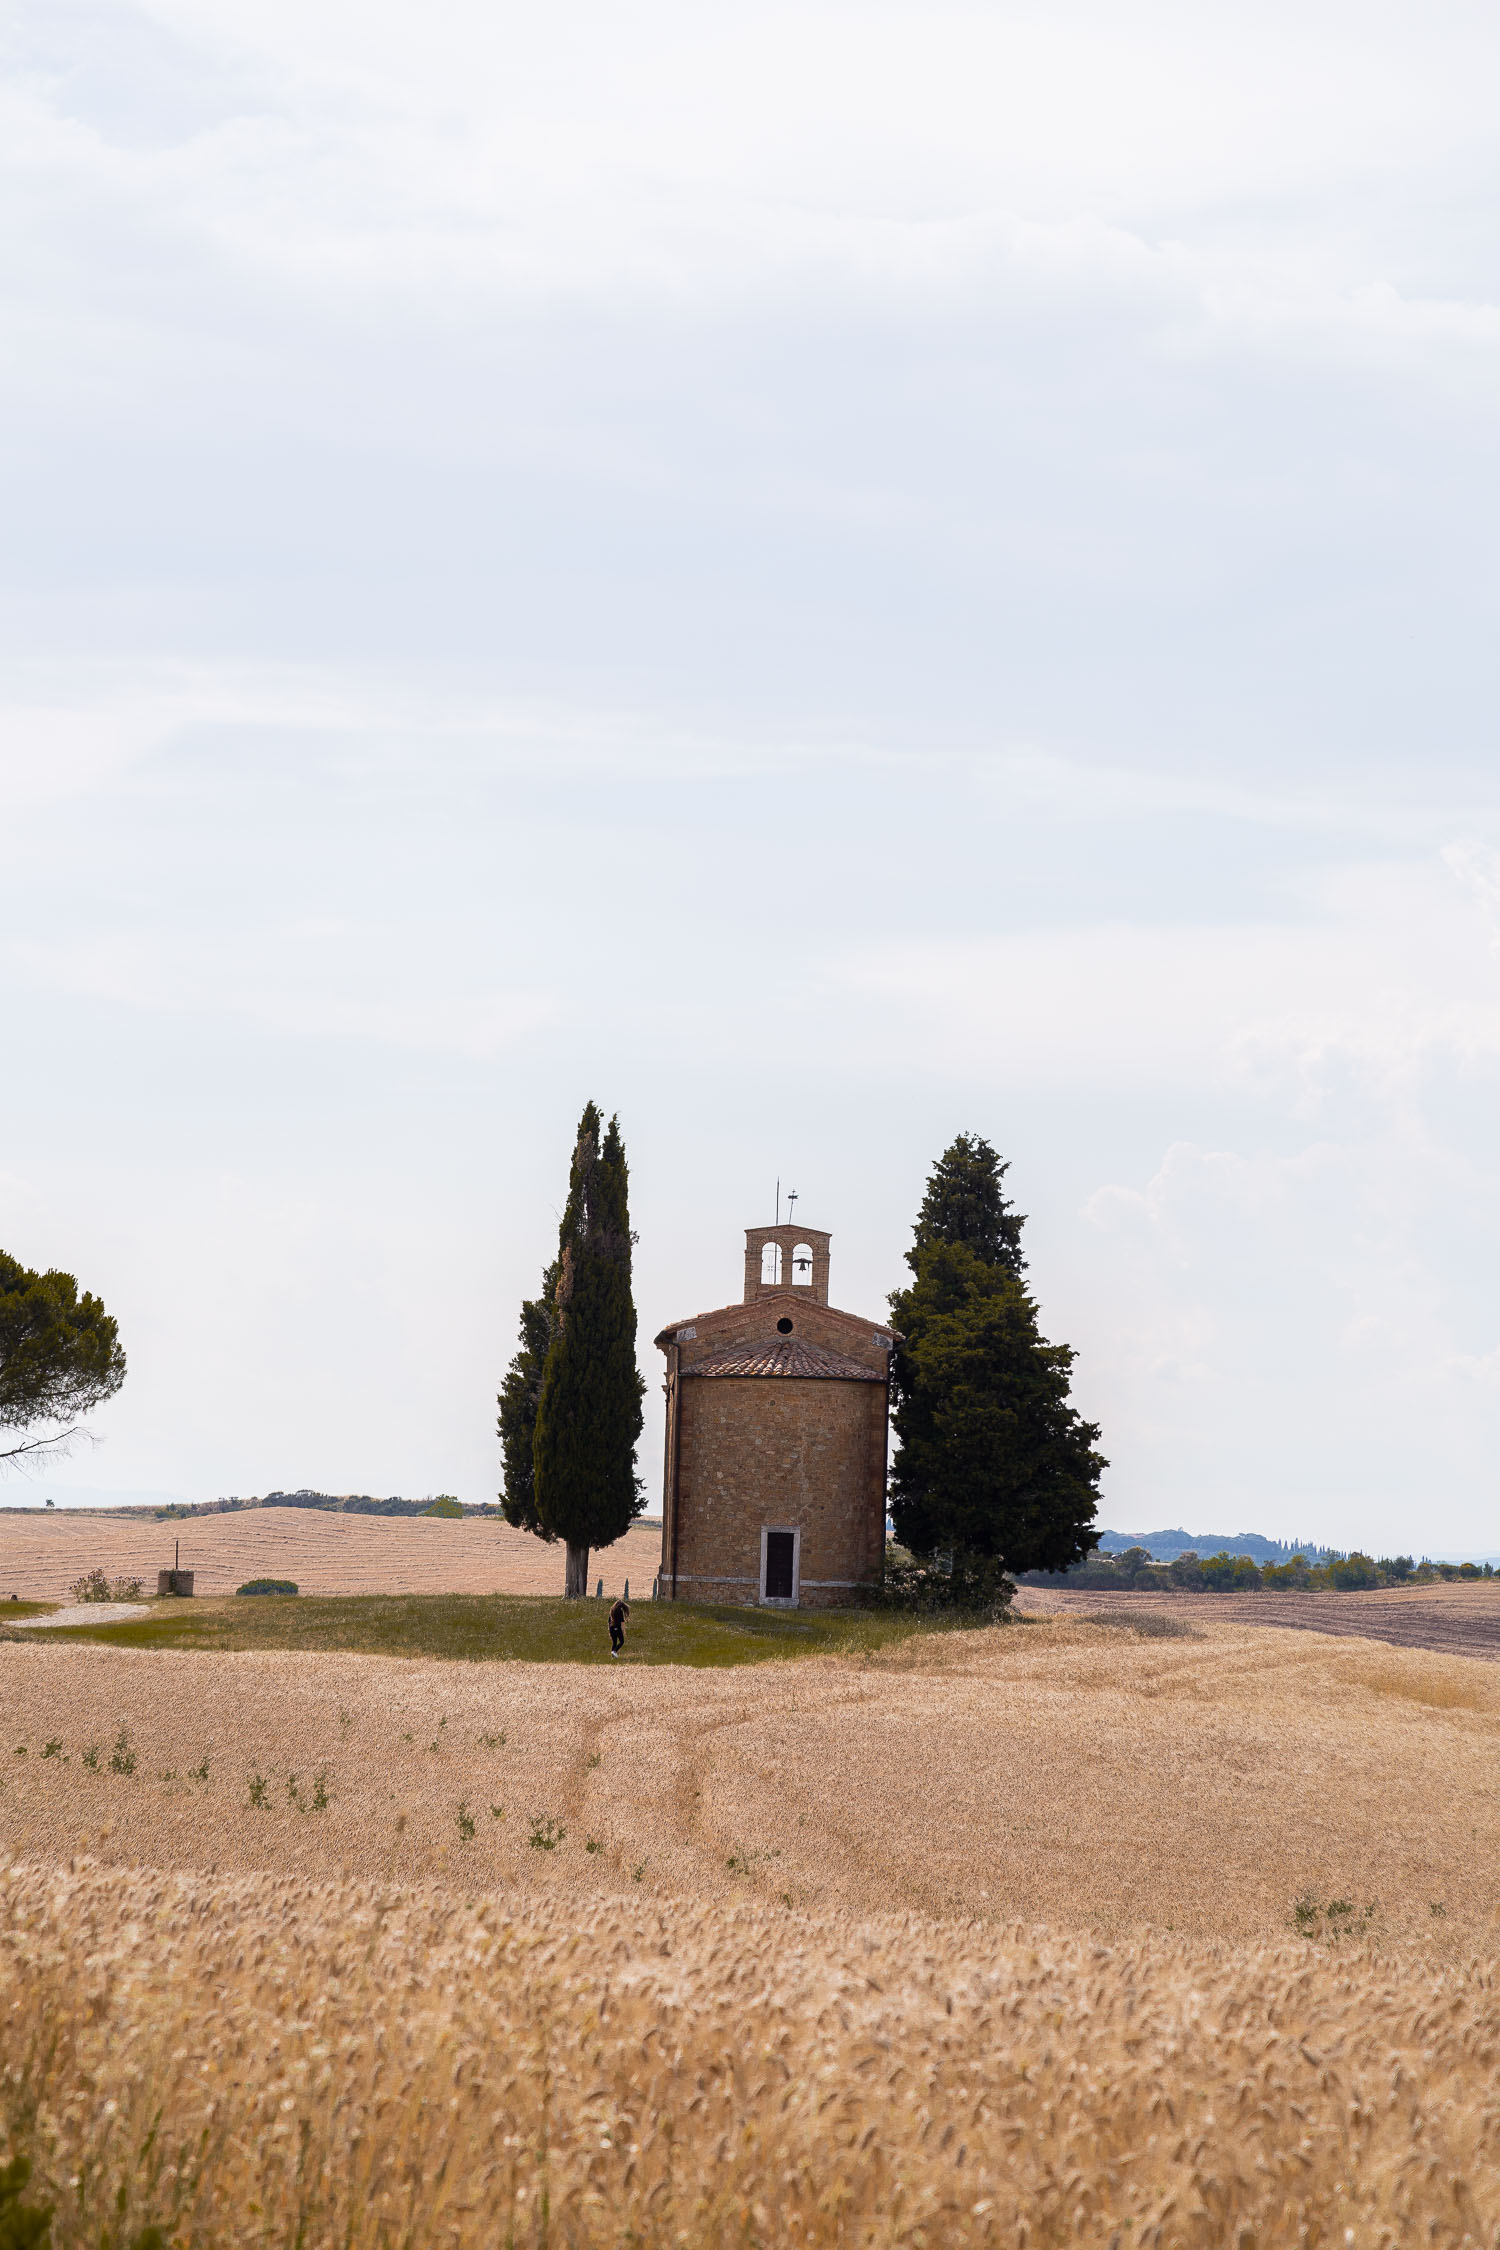 Tuscany-country-church-5233.jpg